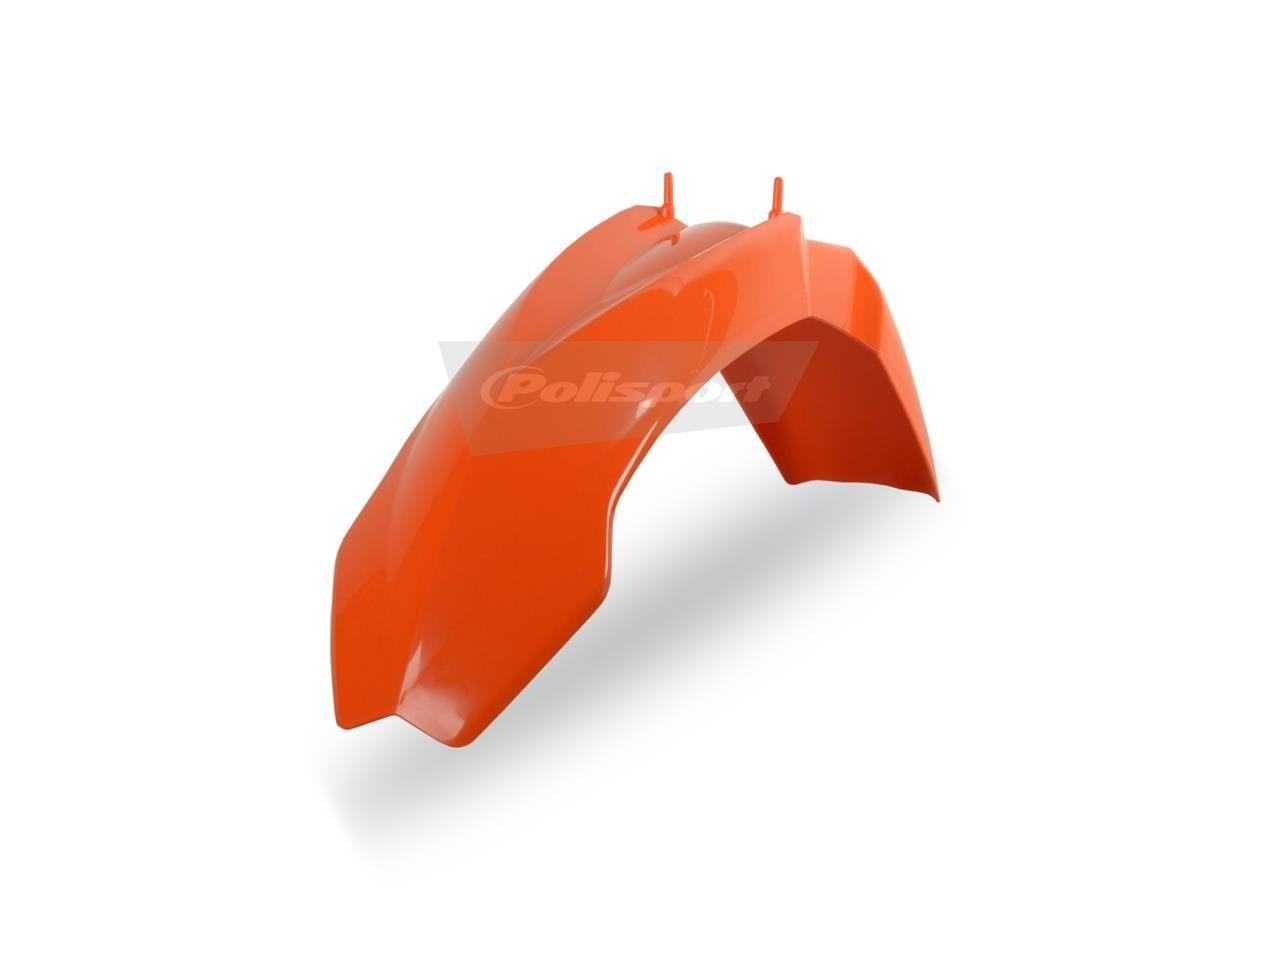 Garde-boue avant Polisport KTM 125 SX 03-06 orange